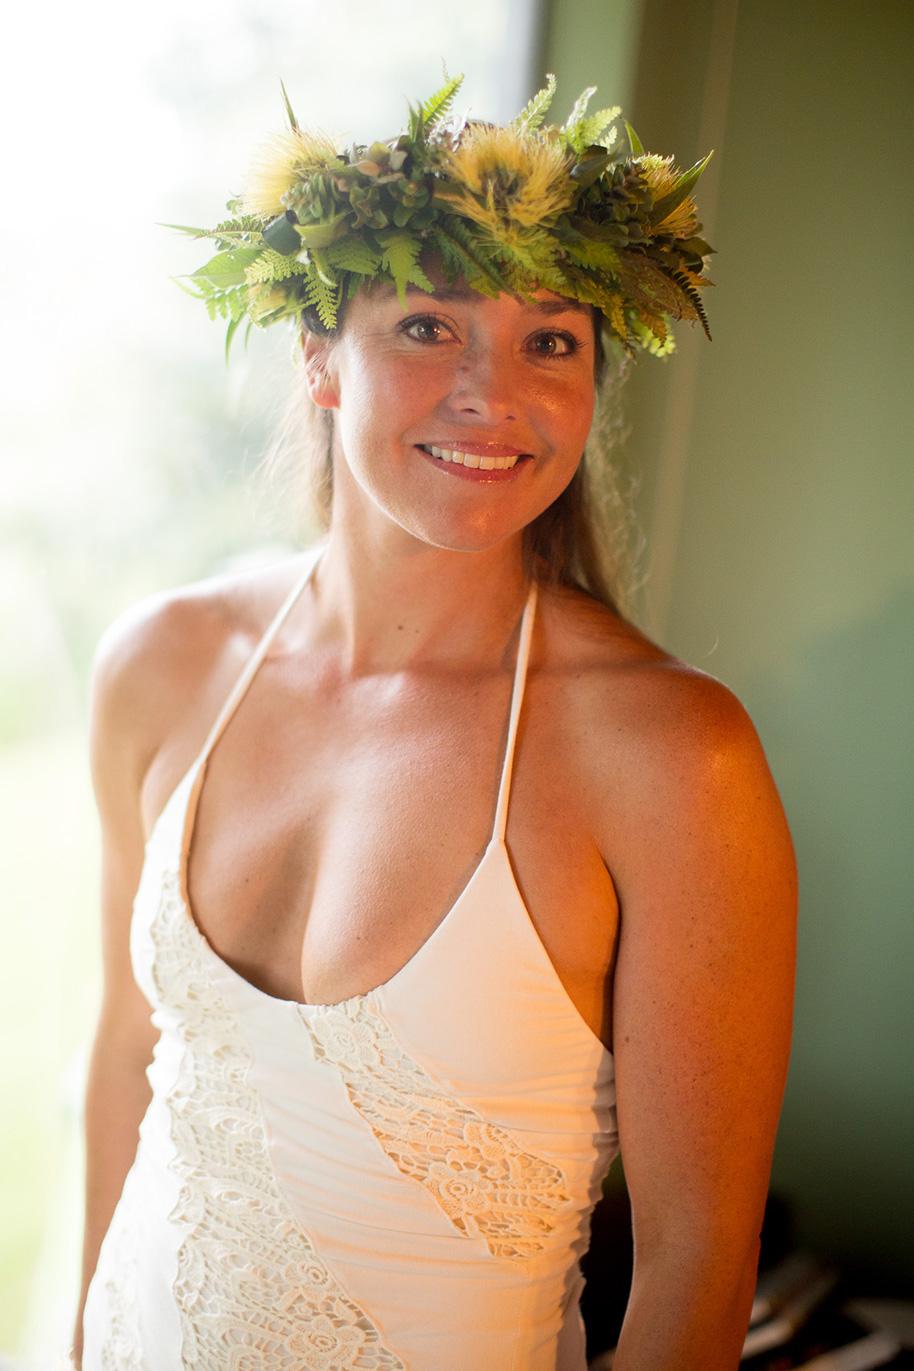 Maui-Ranch-Wedding-032717-3.jpg